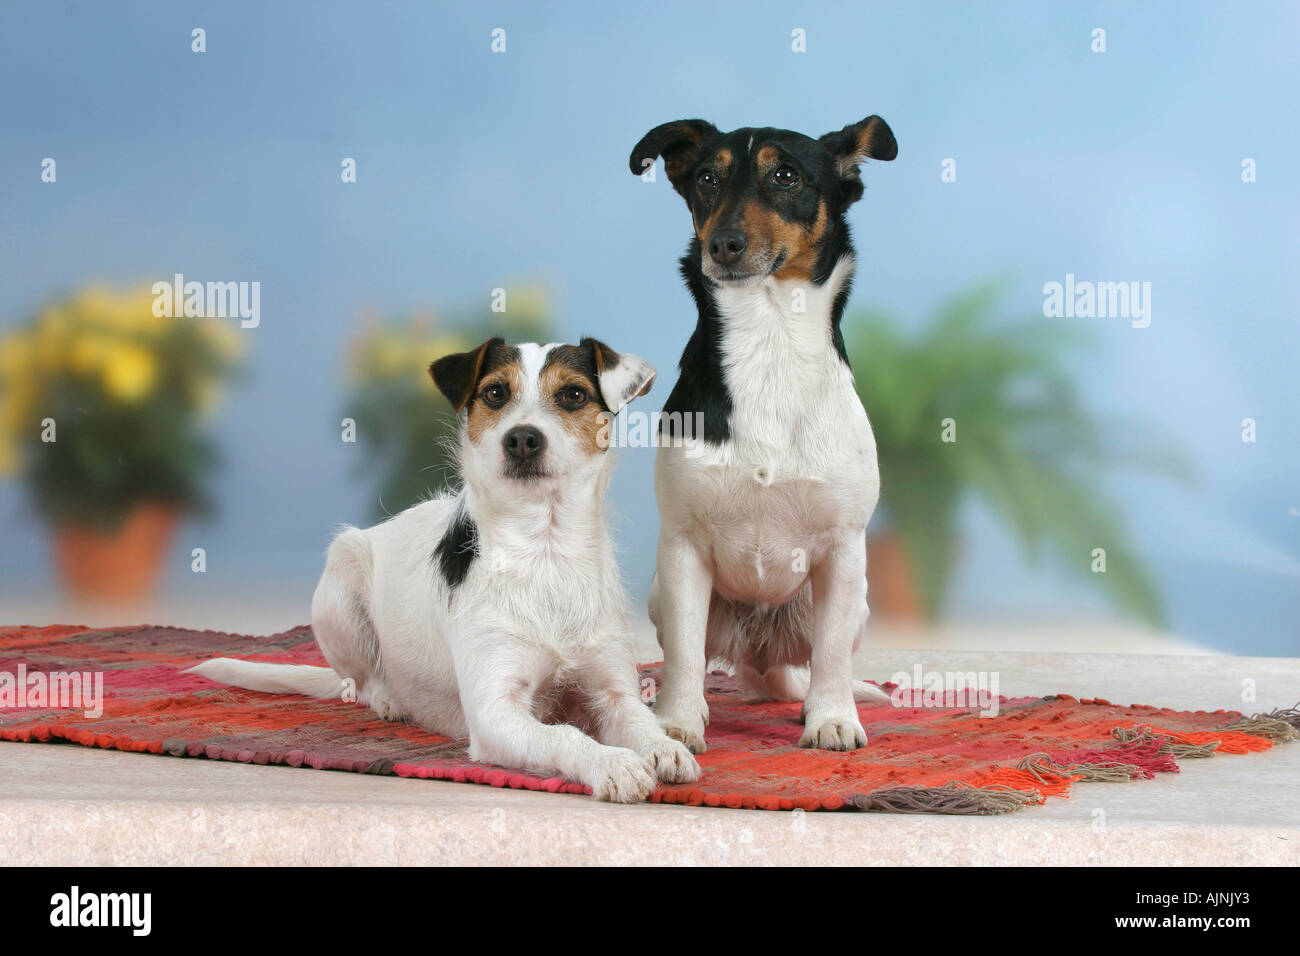 Jack Russell Terrier Pair Stock Photos & Jack Russell Terrier Pair ...